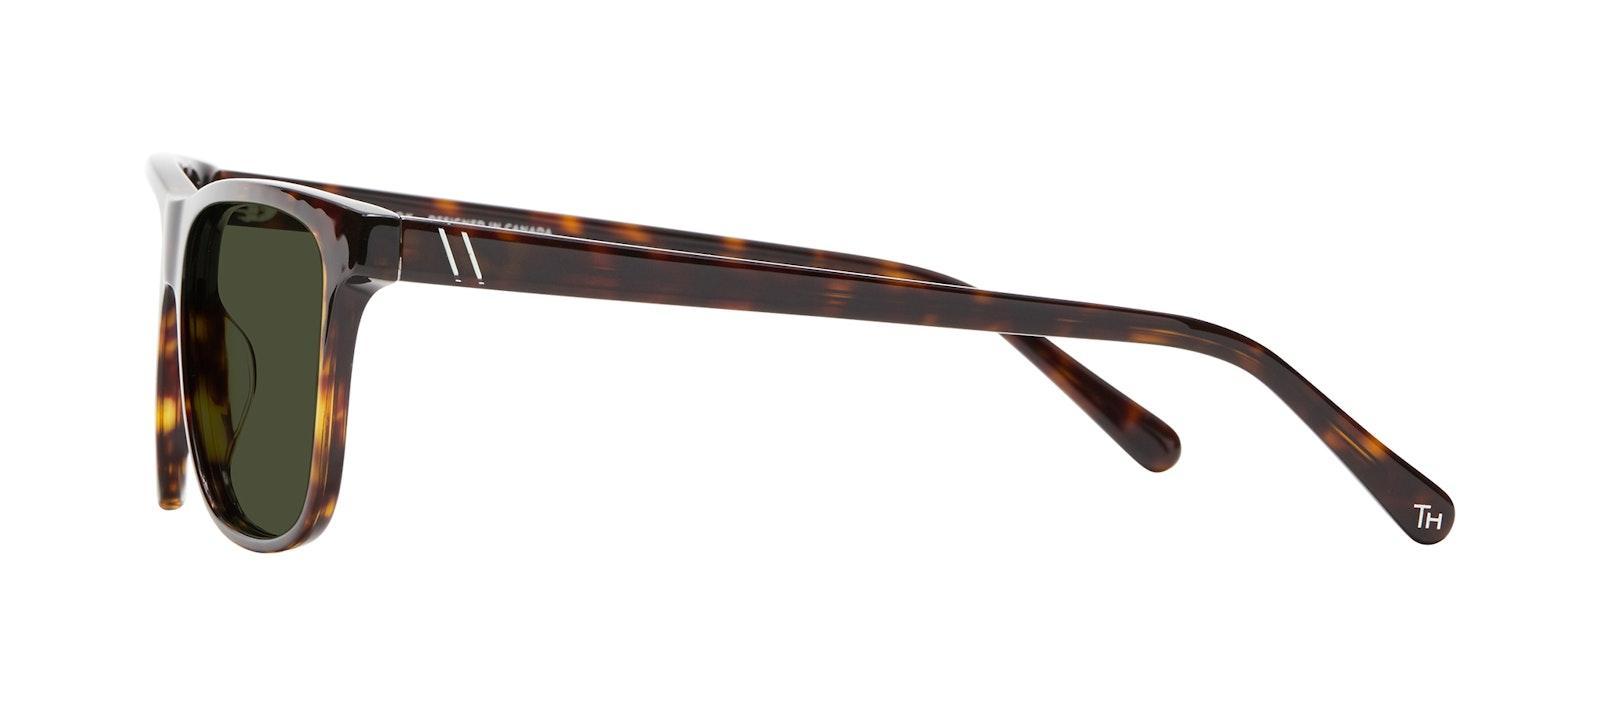 Affordable Fashion Glasses Square Sunglasses Men River Tortoise Side